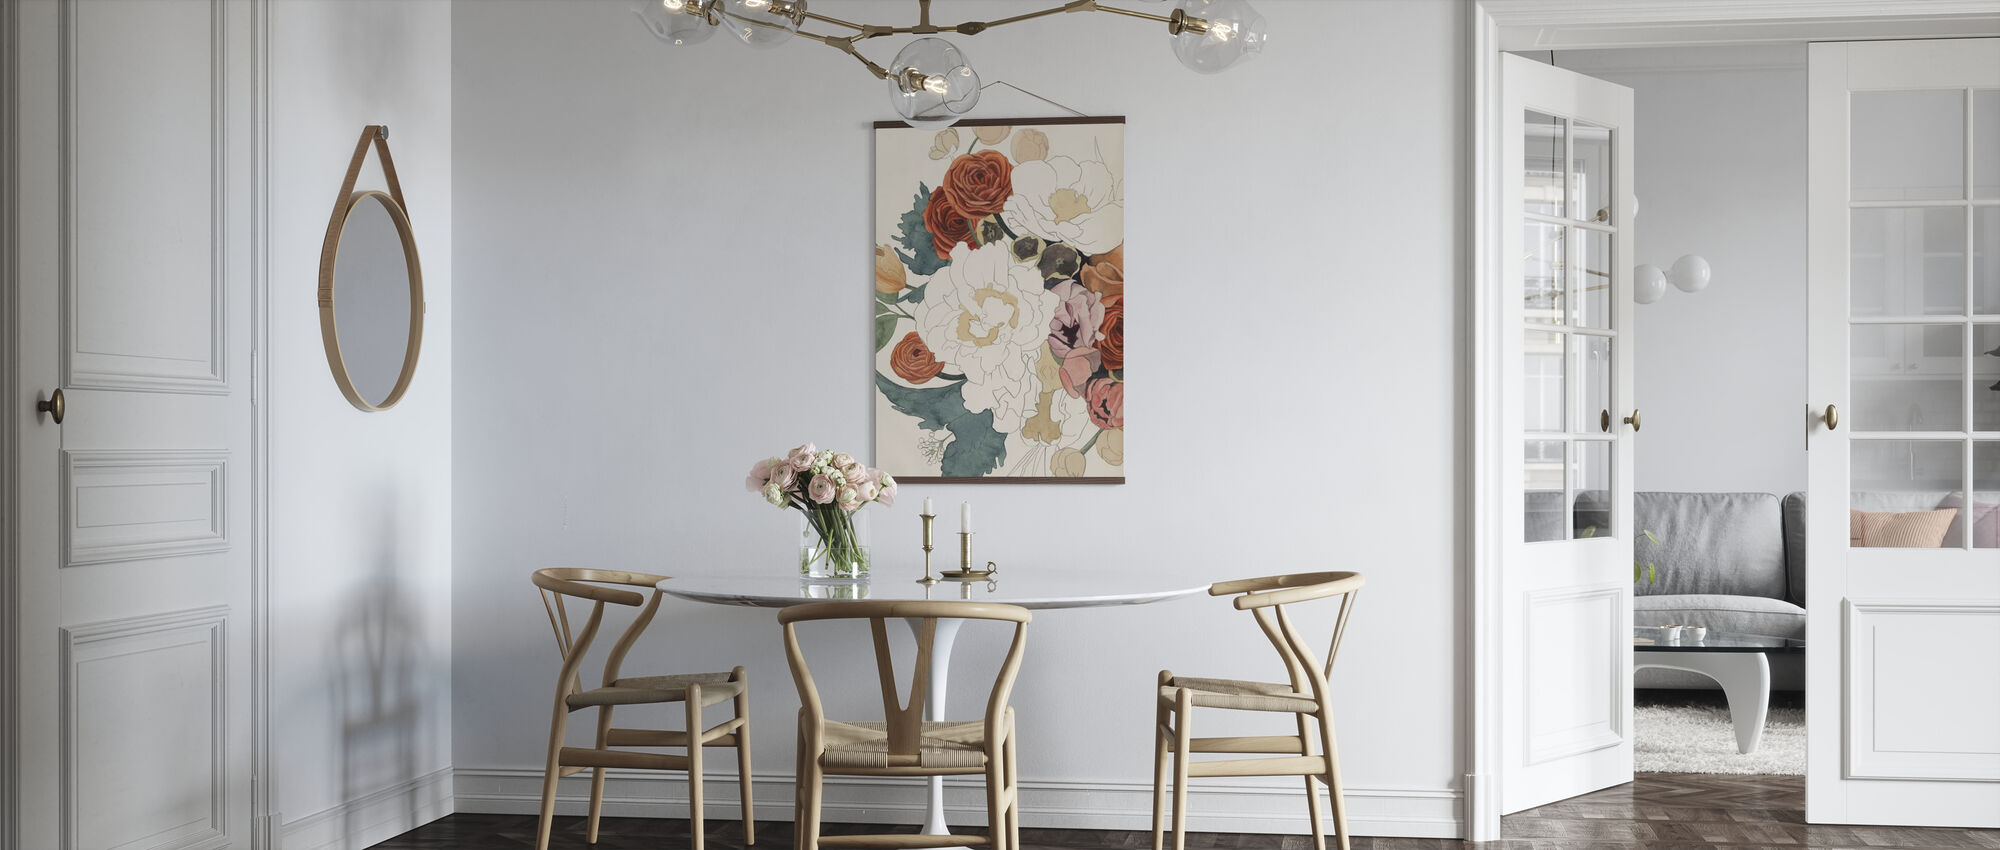 Imperfect Bouquet - Poster - Kitchen